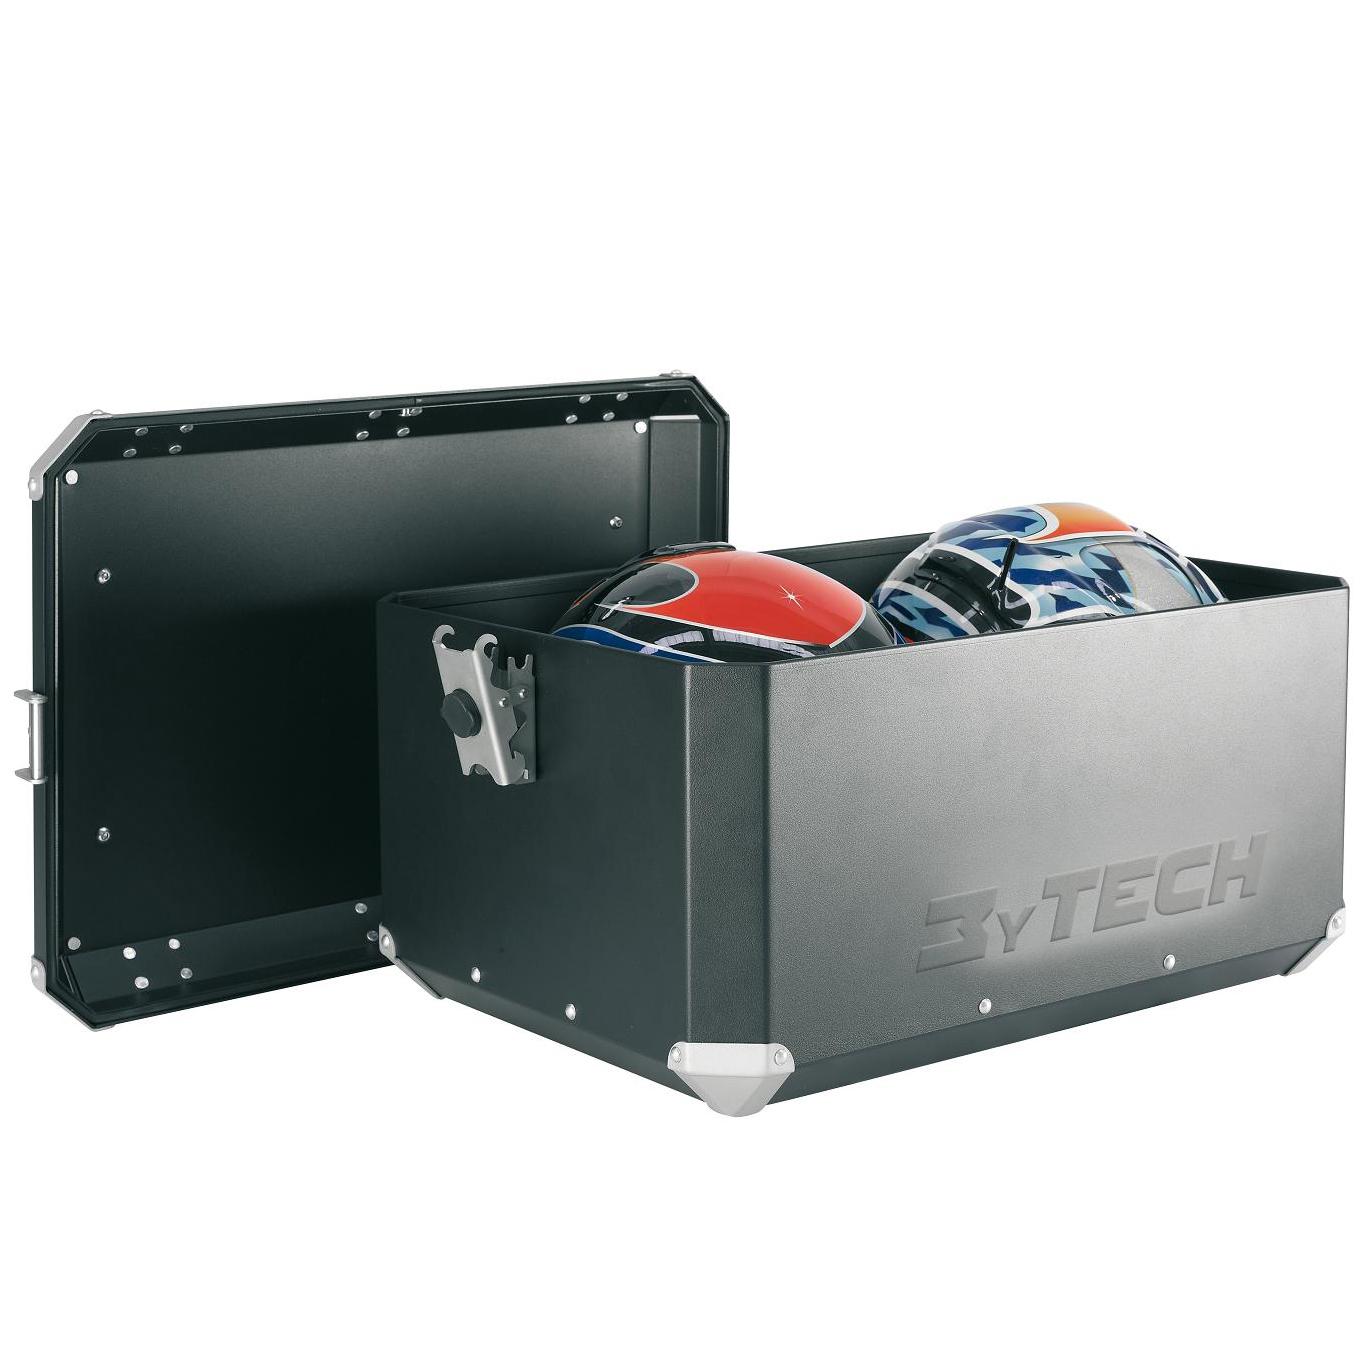 MyTech TOP CASE 55 ltr with Rack - Aluminium ---SAVE